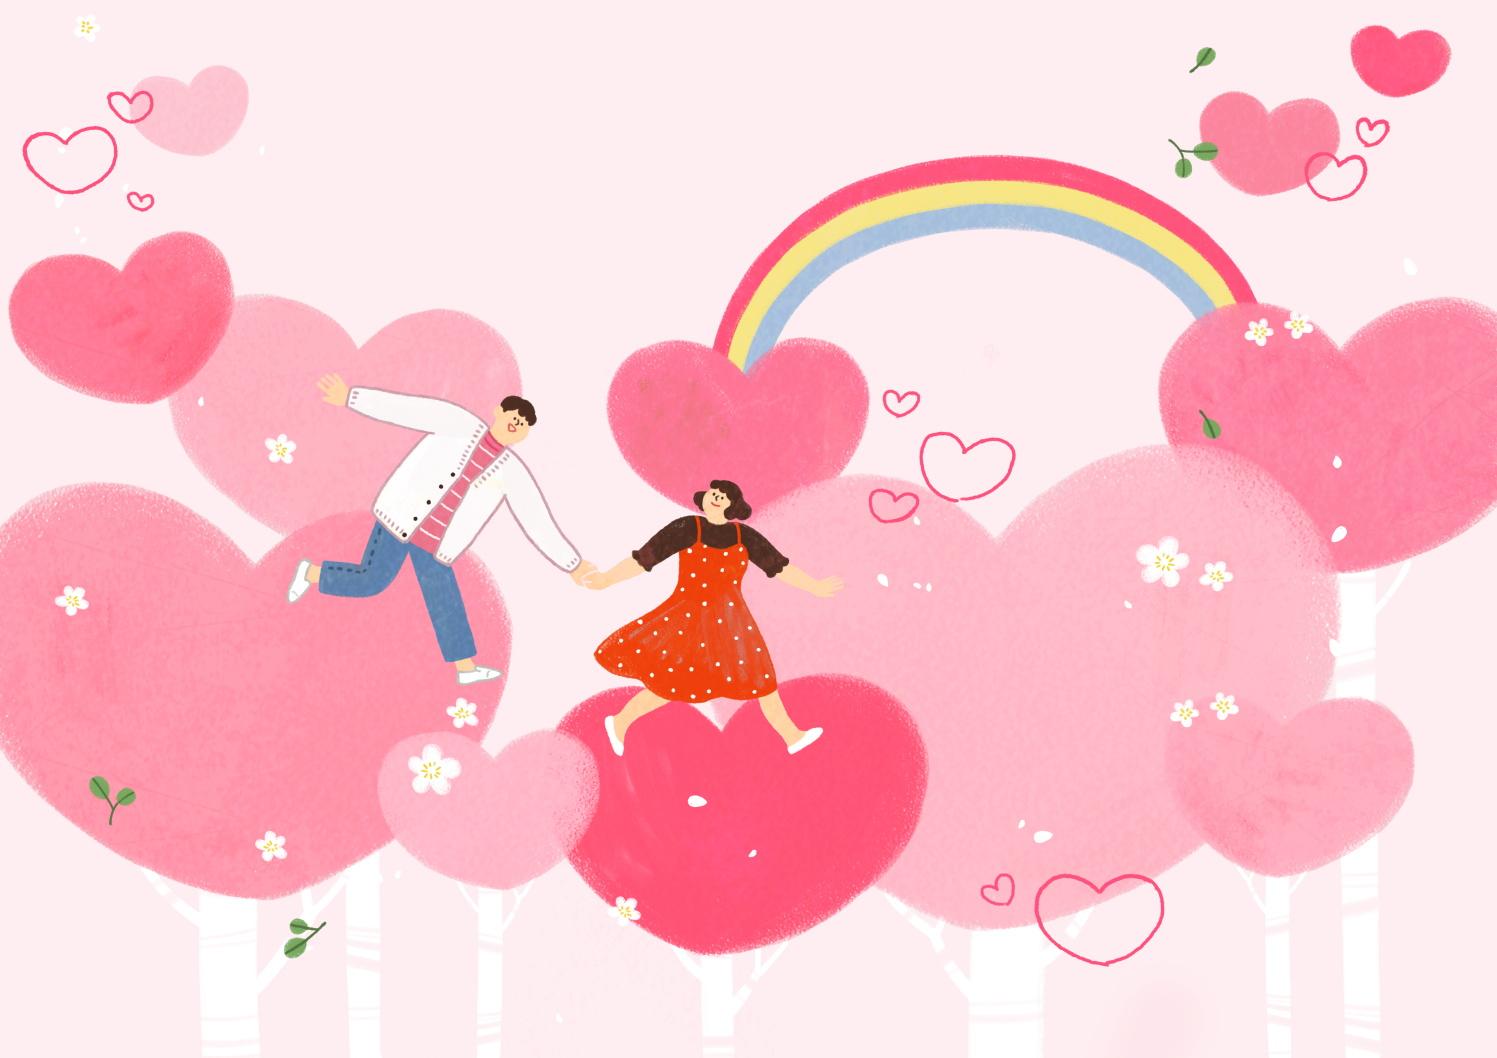 12款情人节七夕情侣手绘插画海报传单设计PSD素材 Valentines Day Couple Hand Drawn Illustration插图11